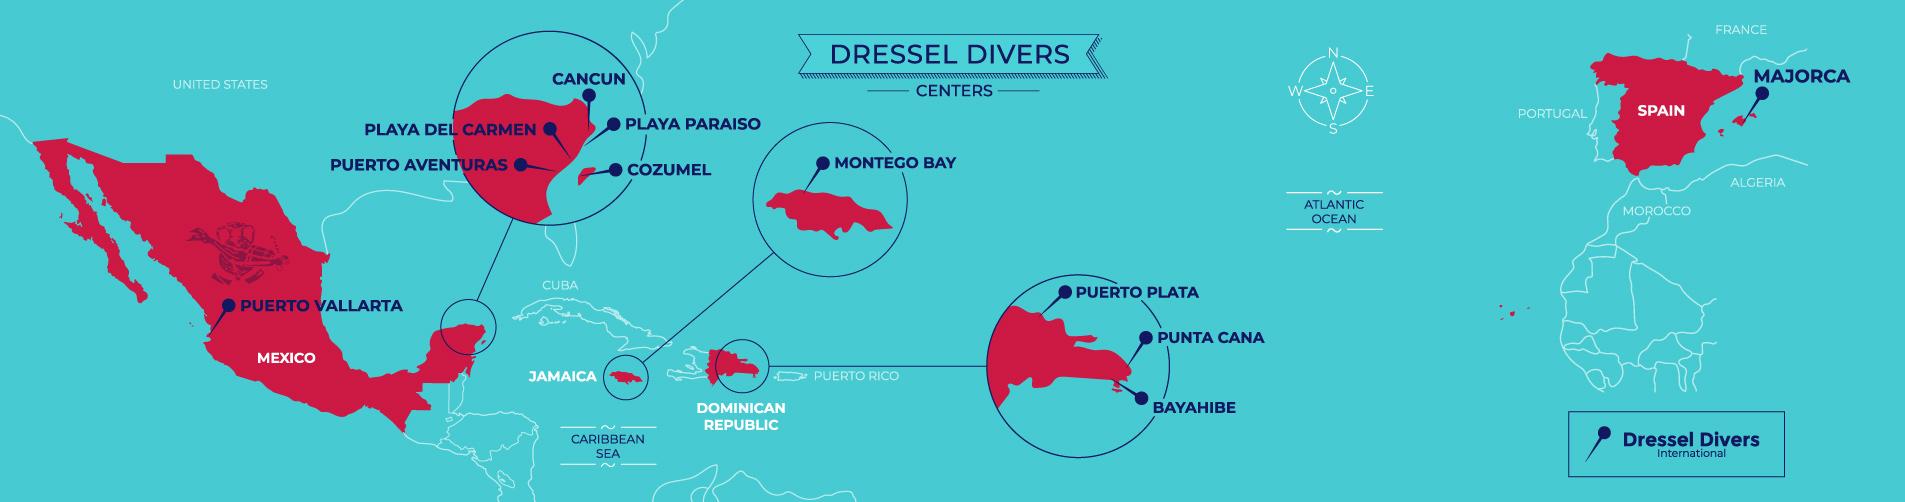 dressel divers centers map